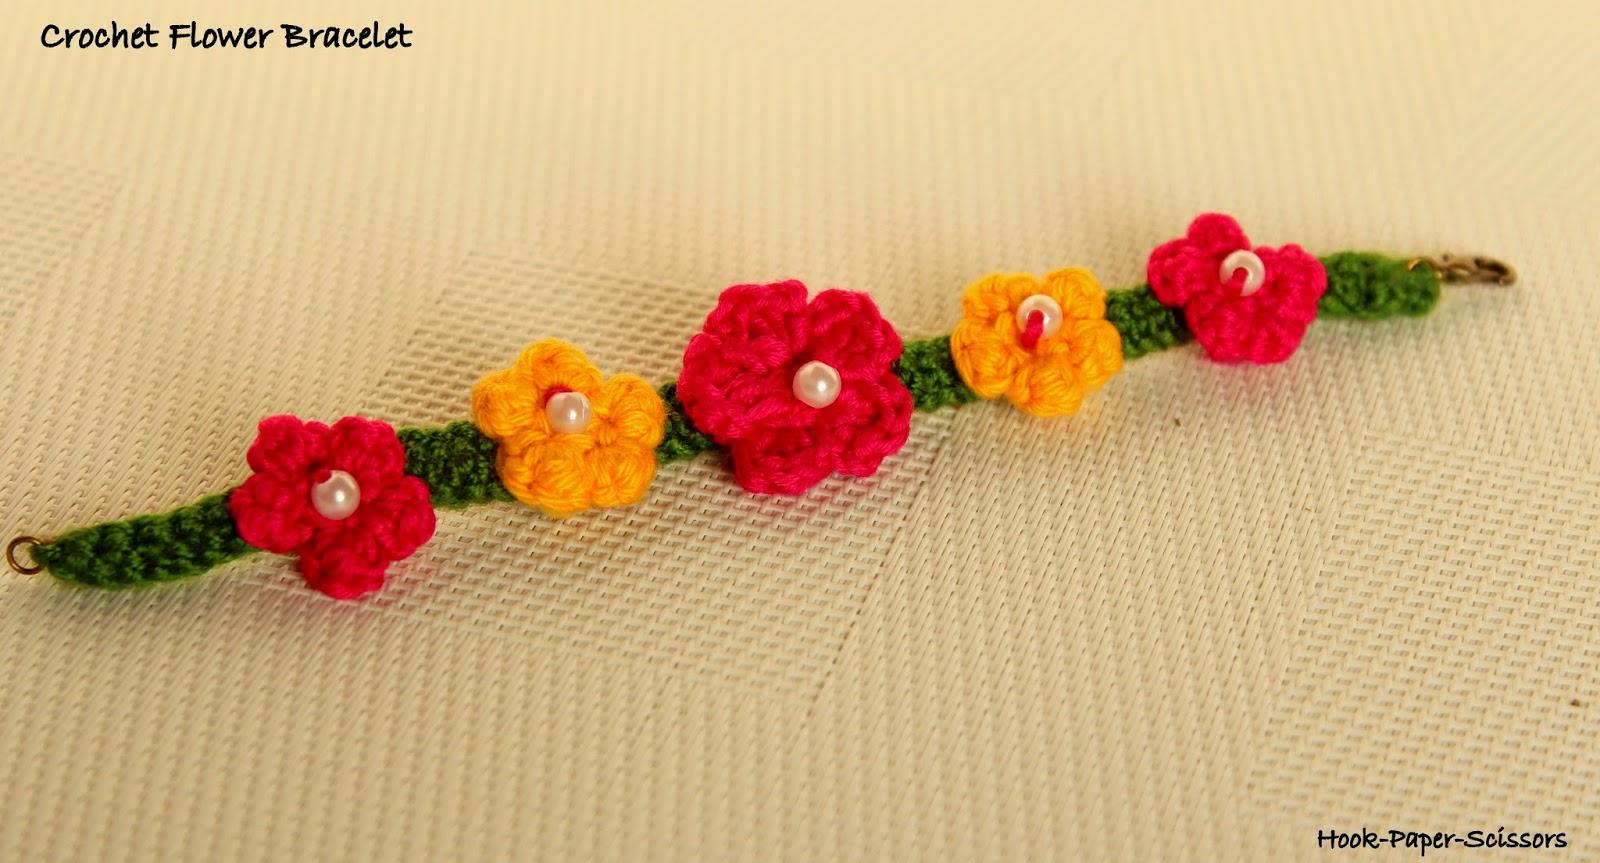 Hook Paper Scissors Crochet Flower Bracelet